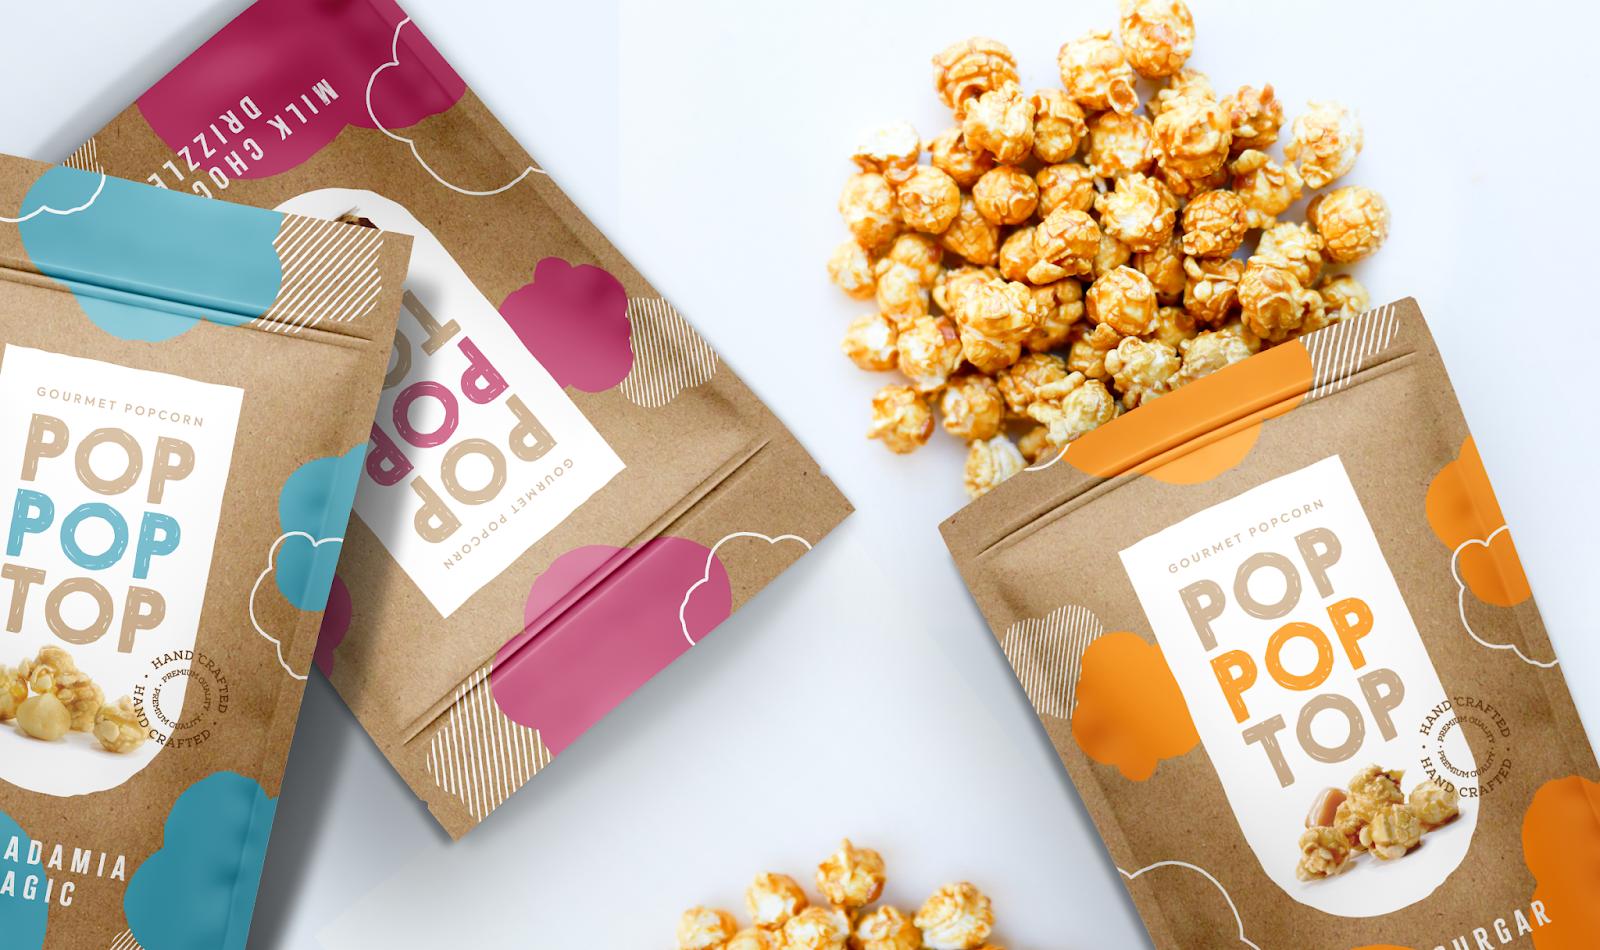 Pop Pop Top爆米花包装设计